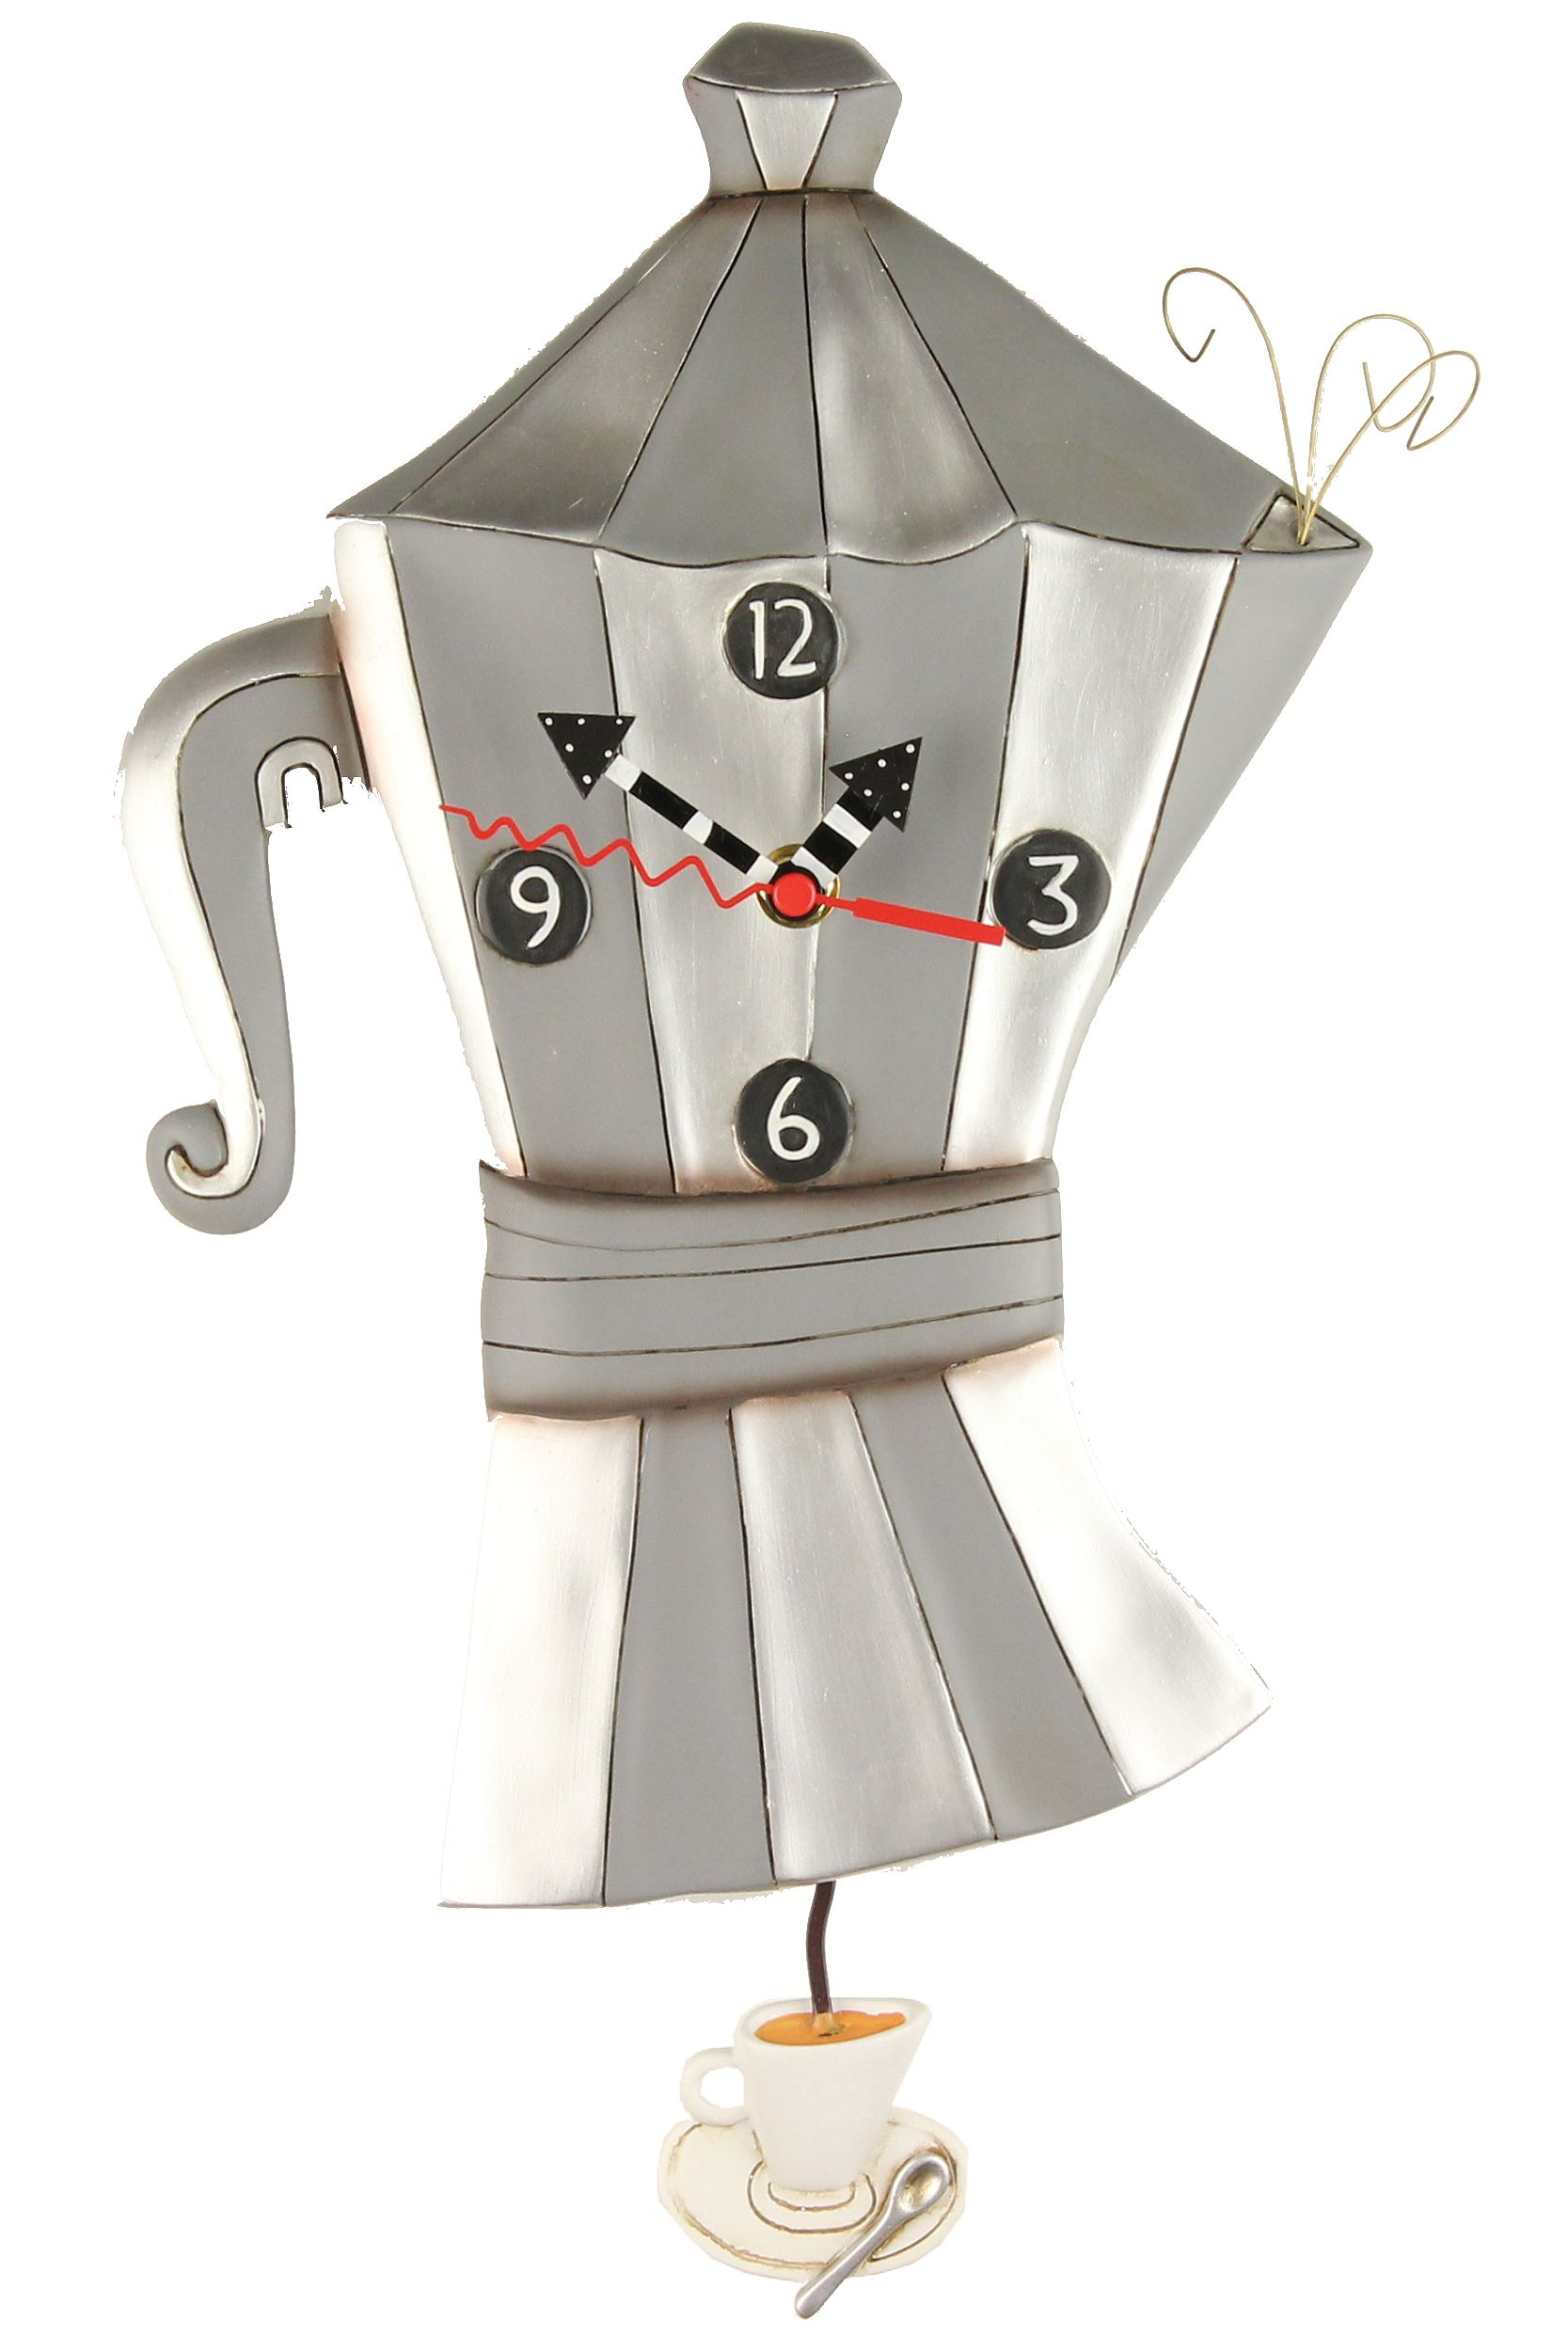 Allen Design -Brew Pot- P1380